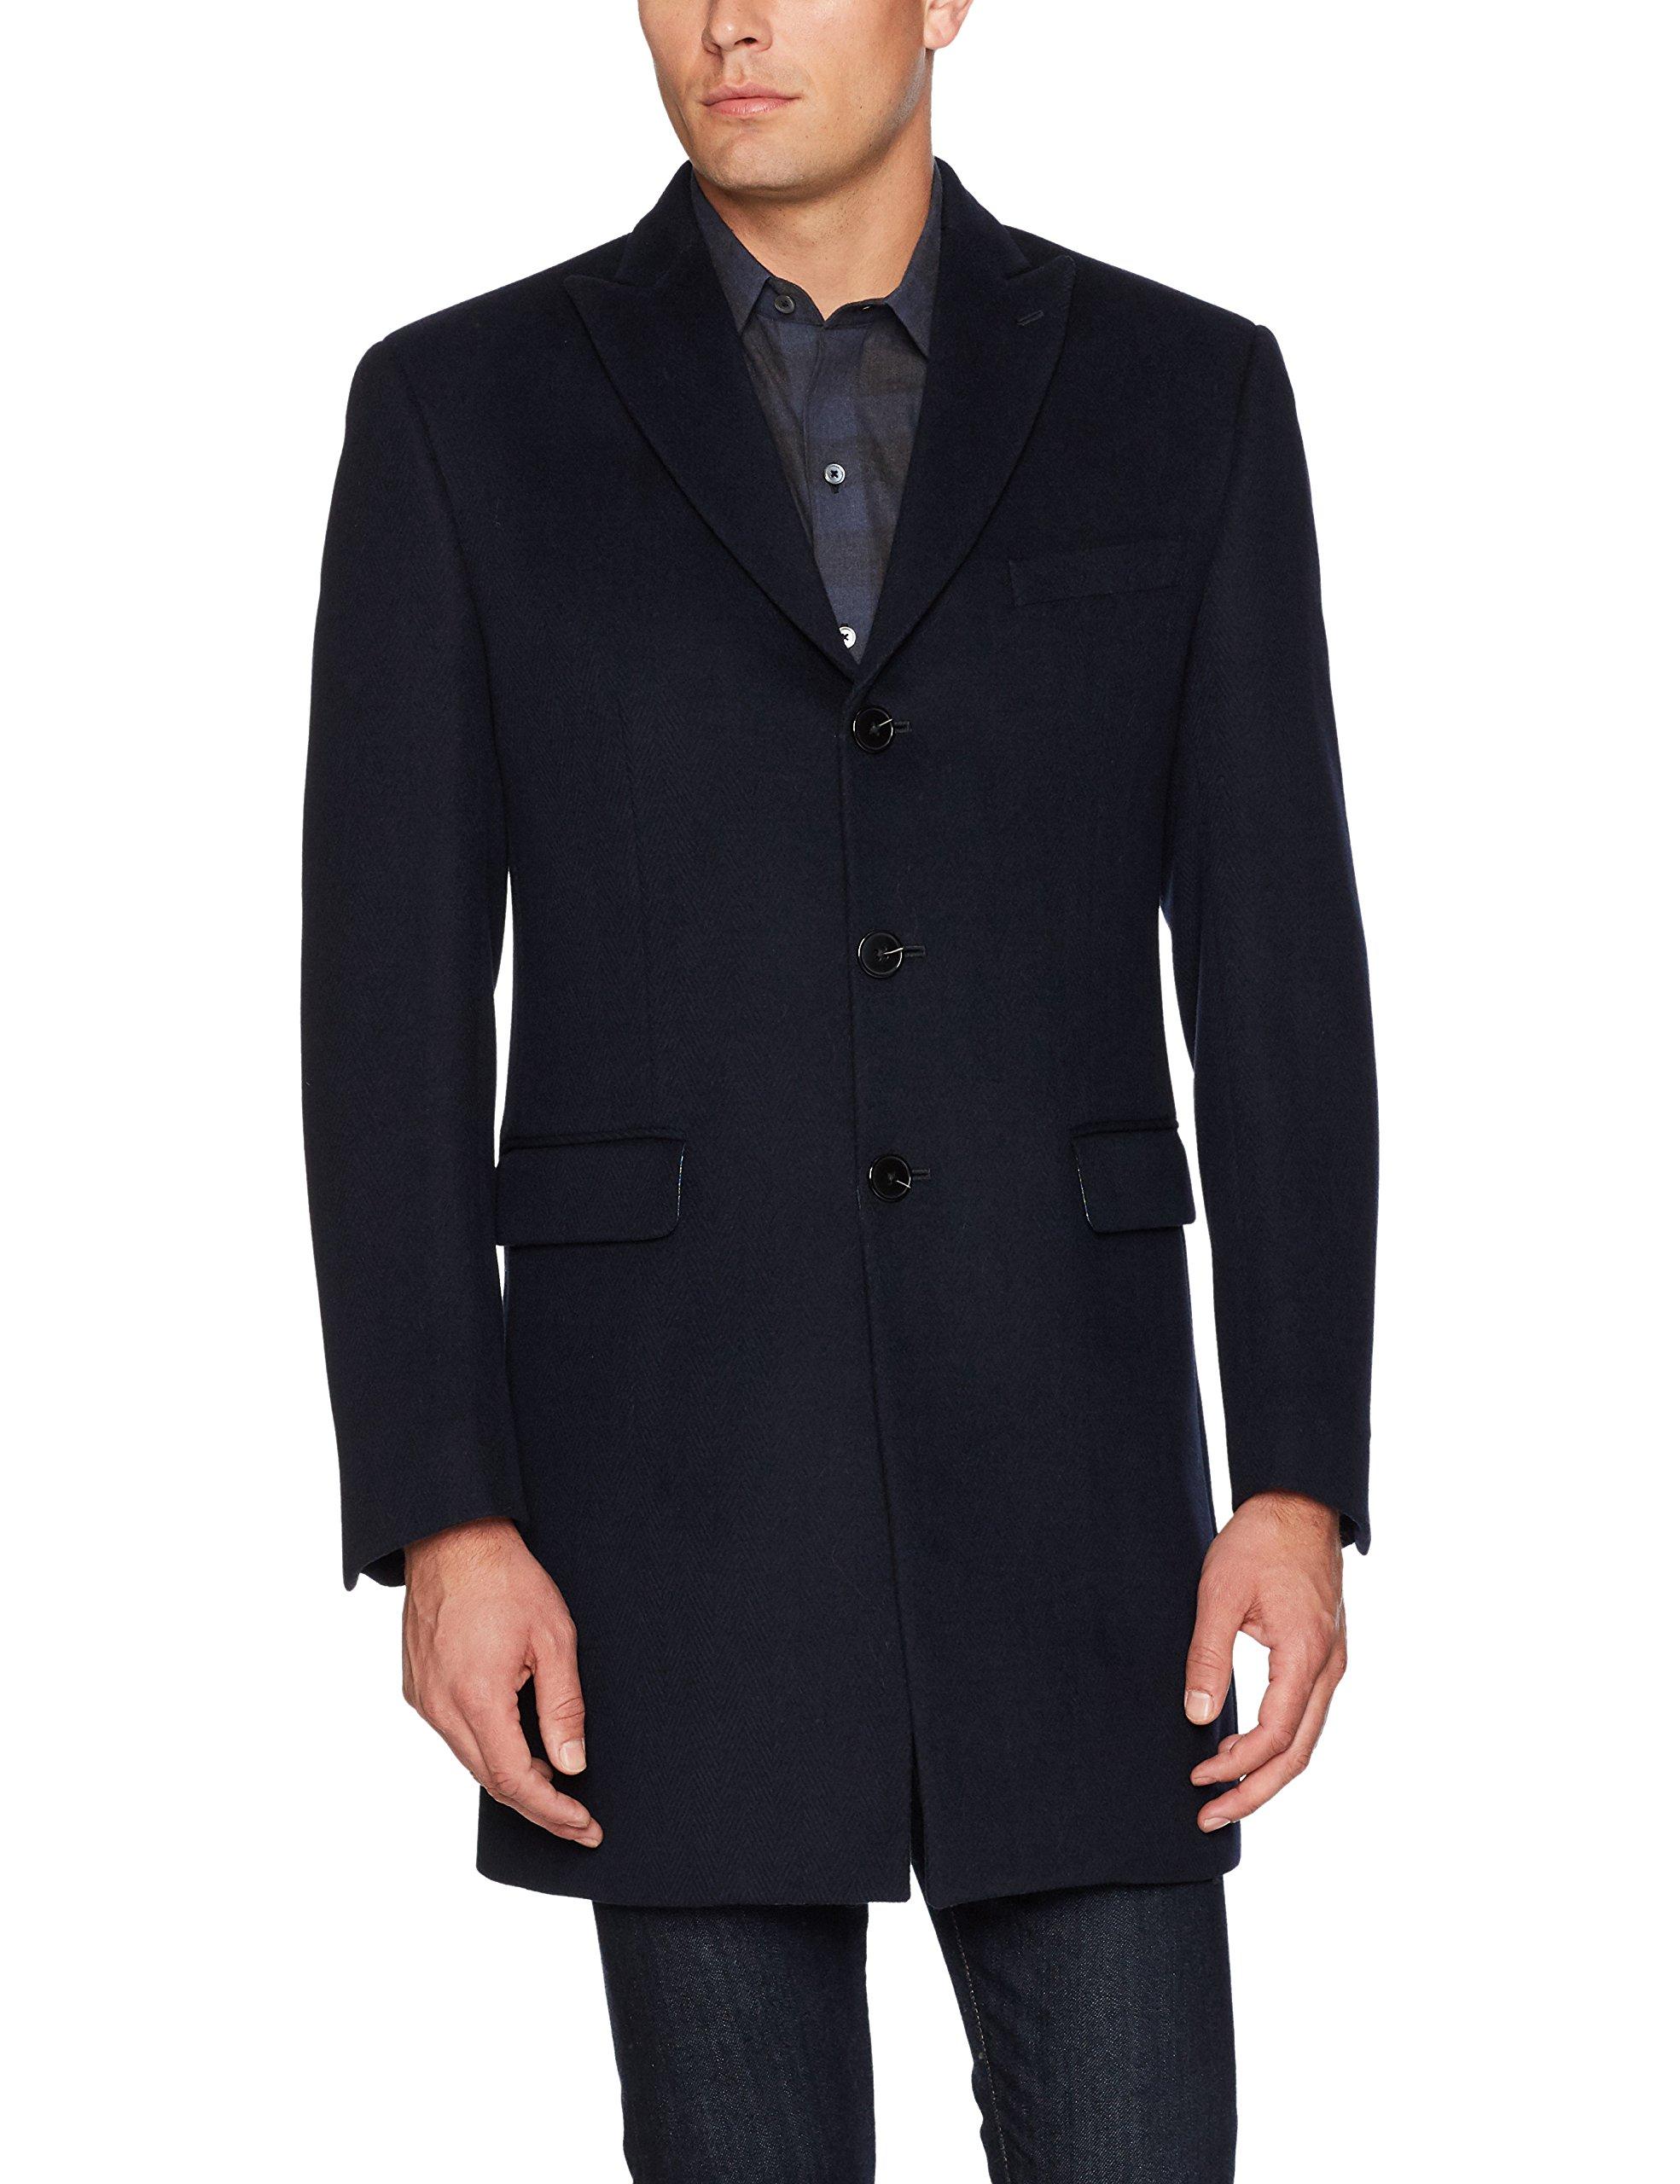 Tallia Men's Versailels Herrring Bone Three Button Peak Lapel Wool Blend Coat, Navy, L